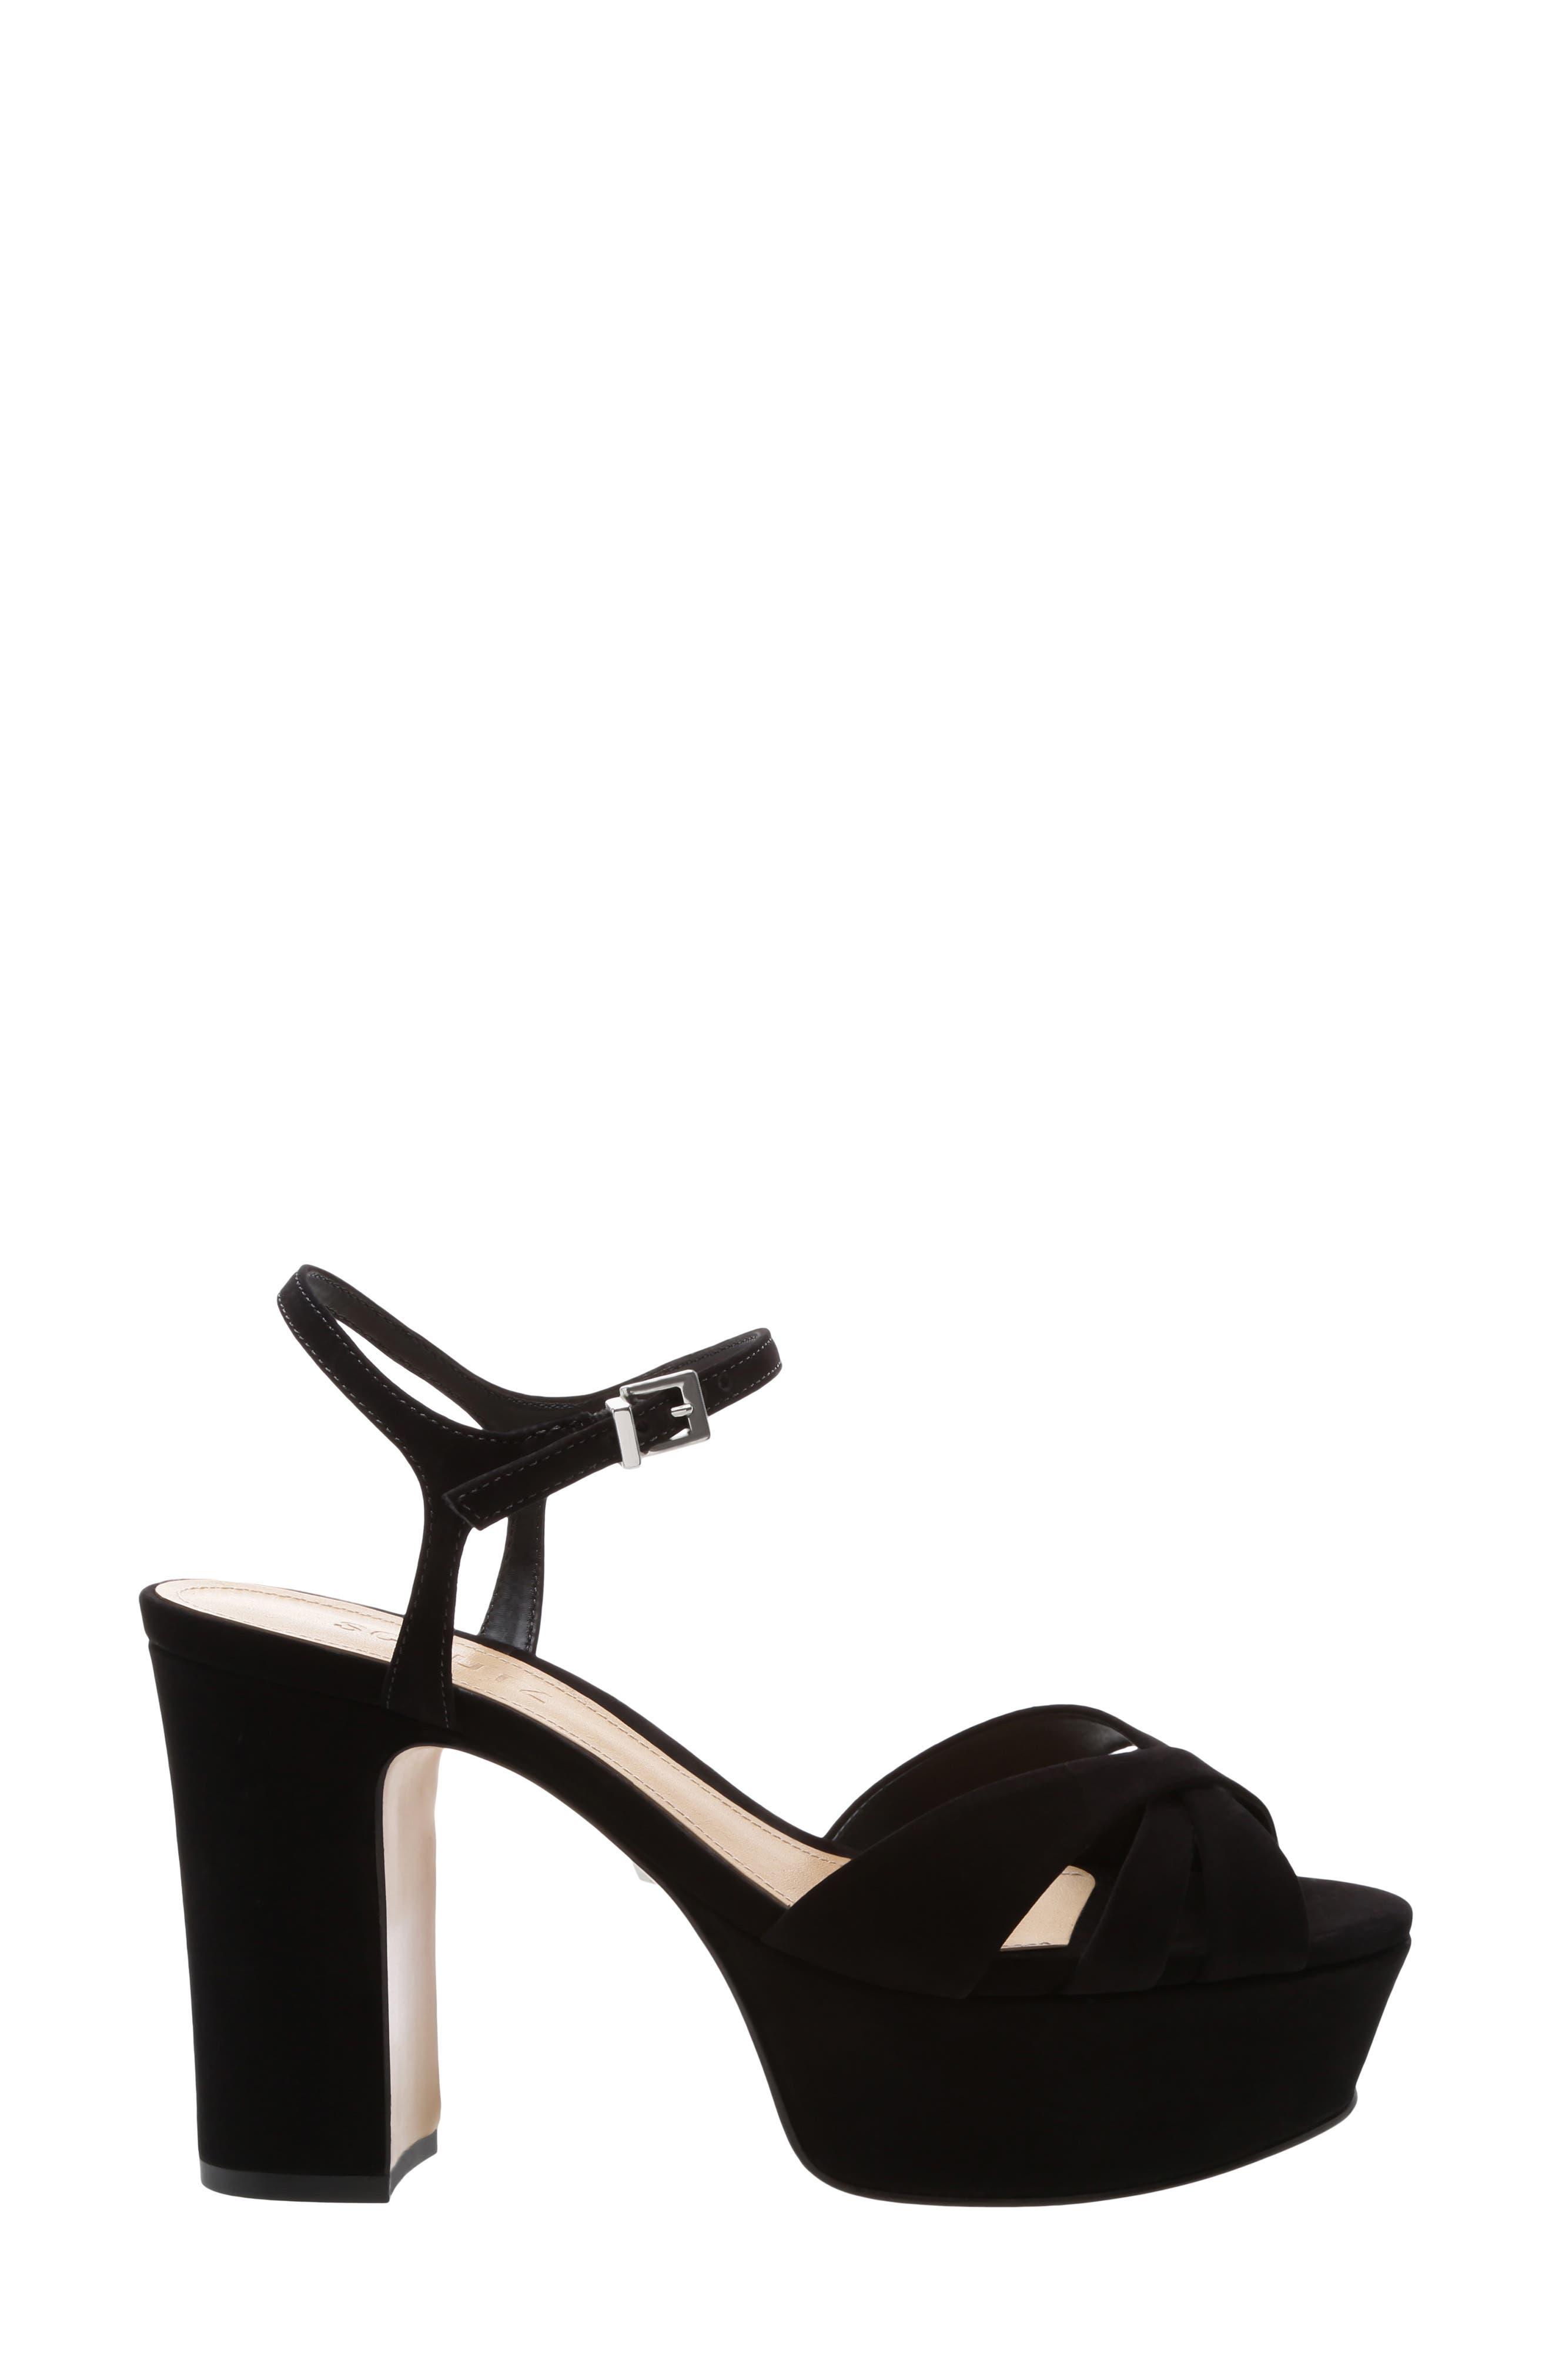 SCHUTZ, Keefa Platform Sandal, Alternate thumbnail 3, color, BLACK NUBUCK LEATHER